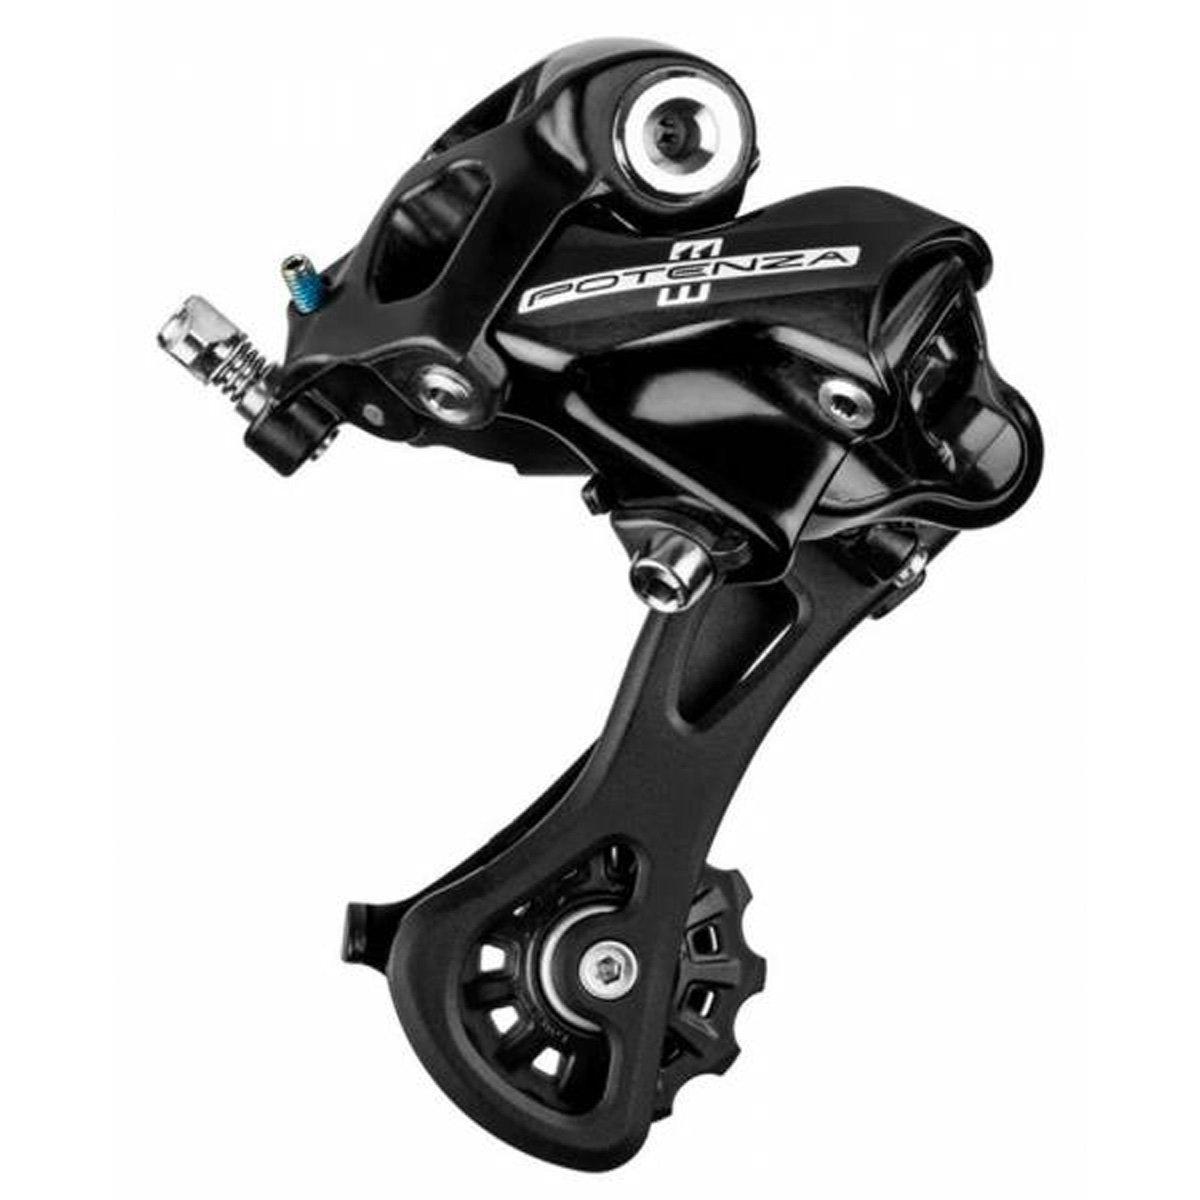 Campagnolo Potenza Ho rd18 11-speed背面自転車Derailleur B072ZZYWDQ M(ミドル)(RD18-POB1M)|ブラック ブラック M(ミドル)(RD18-POB1M)